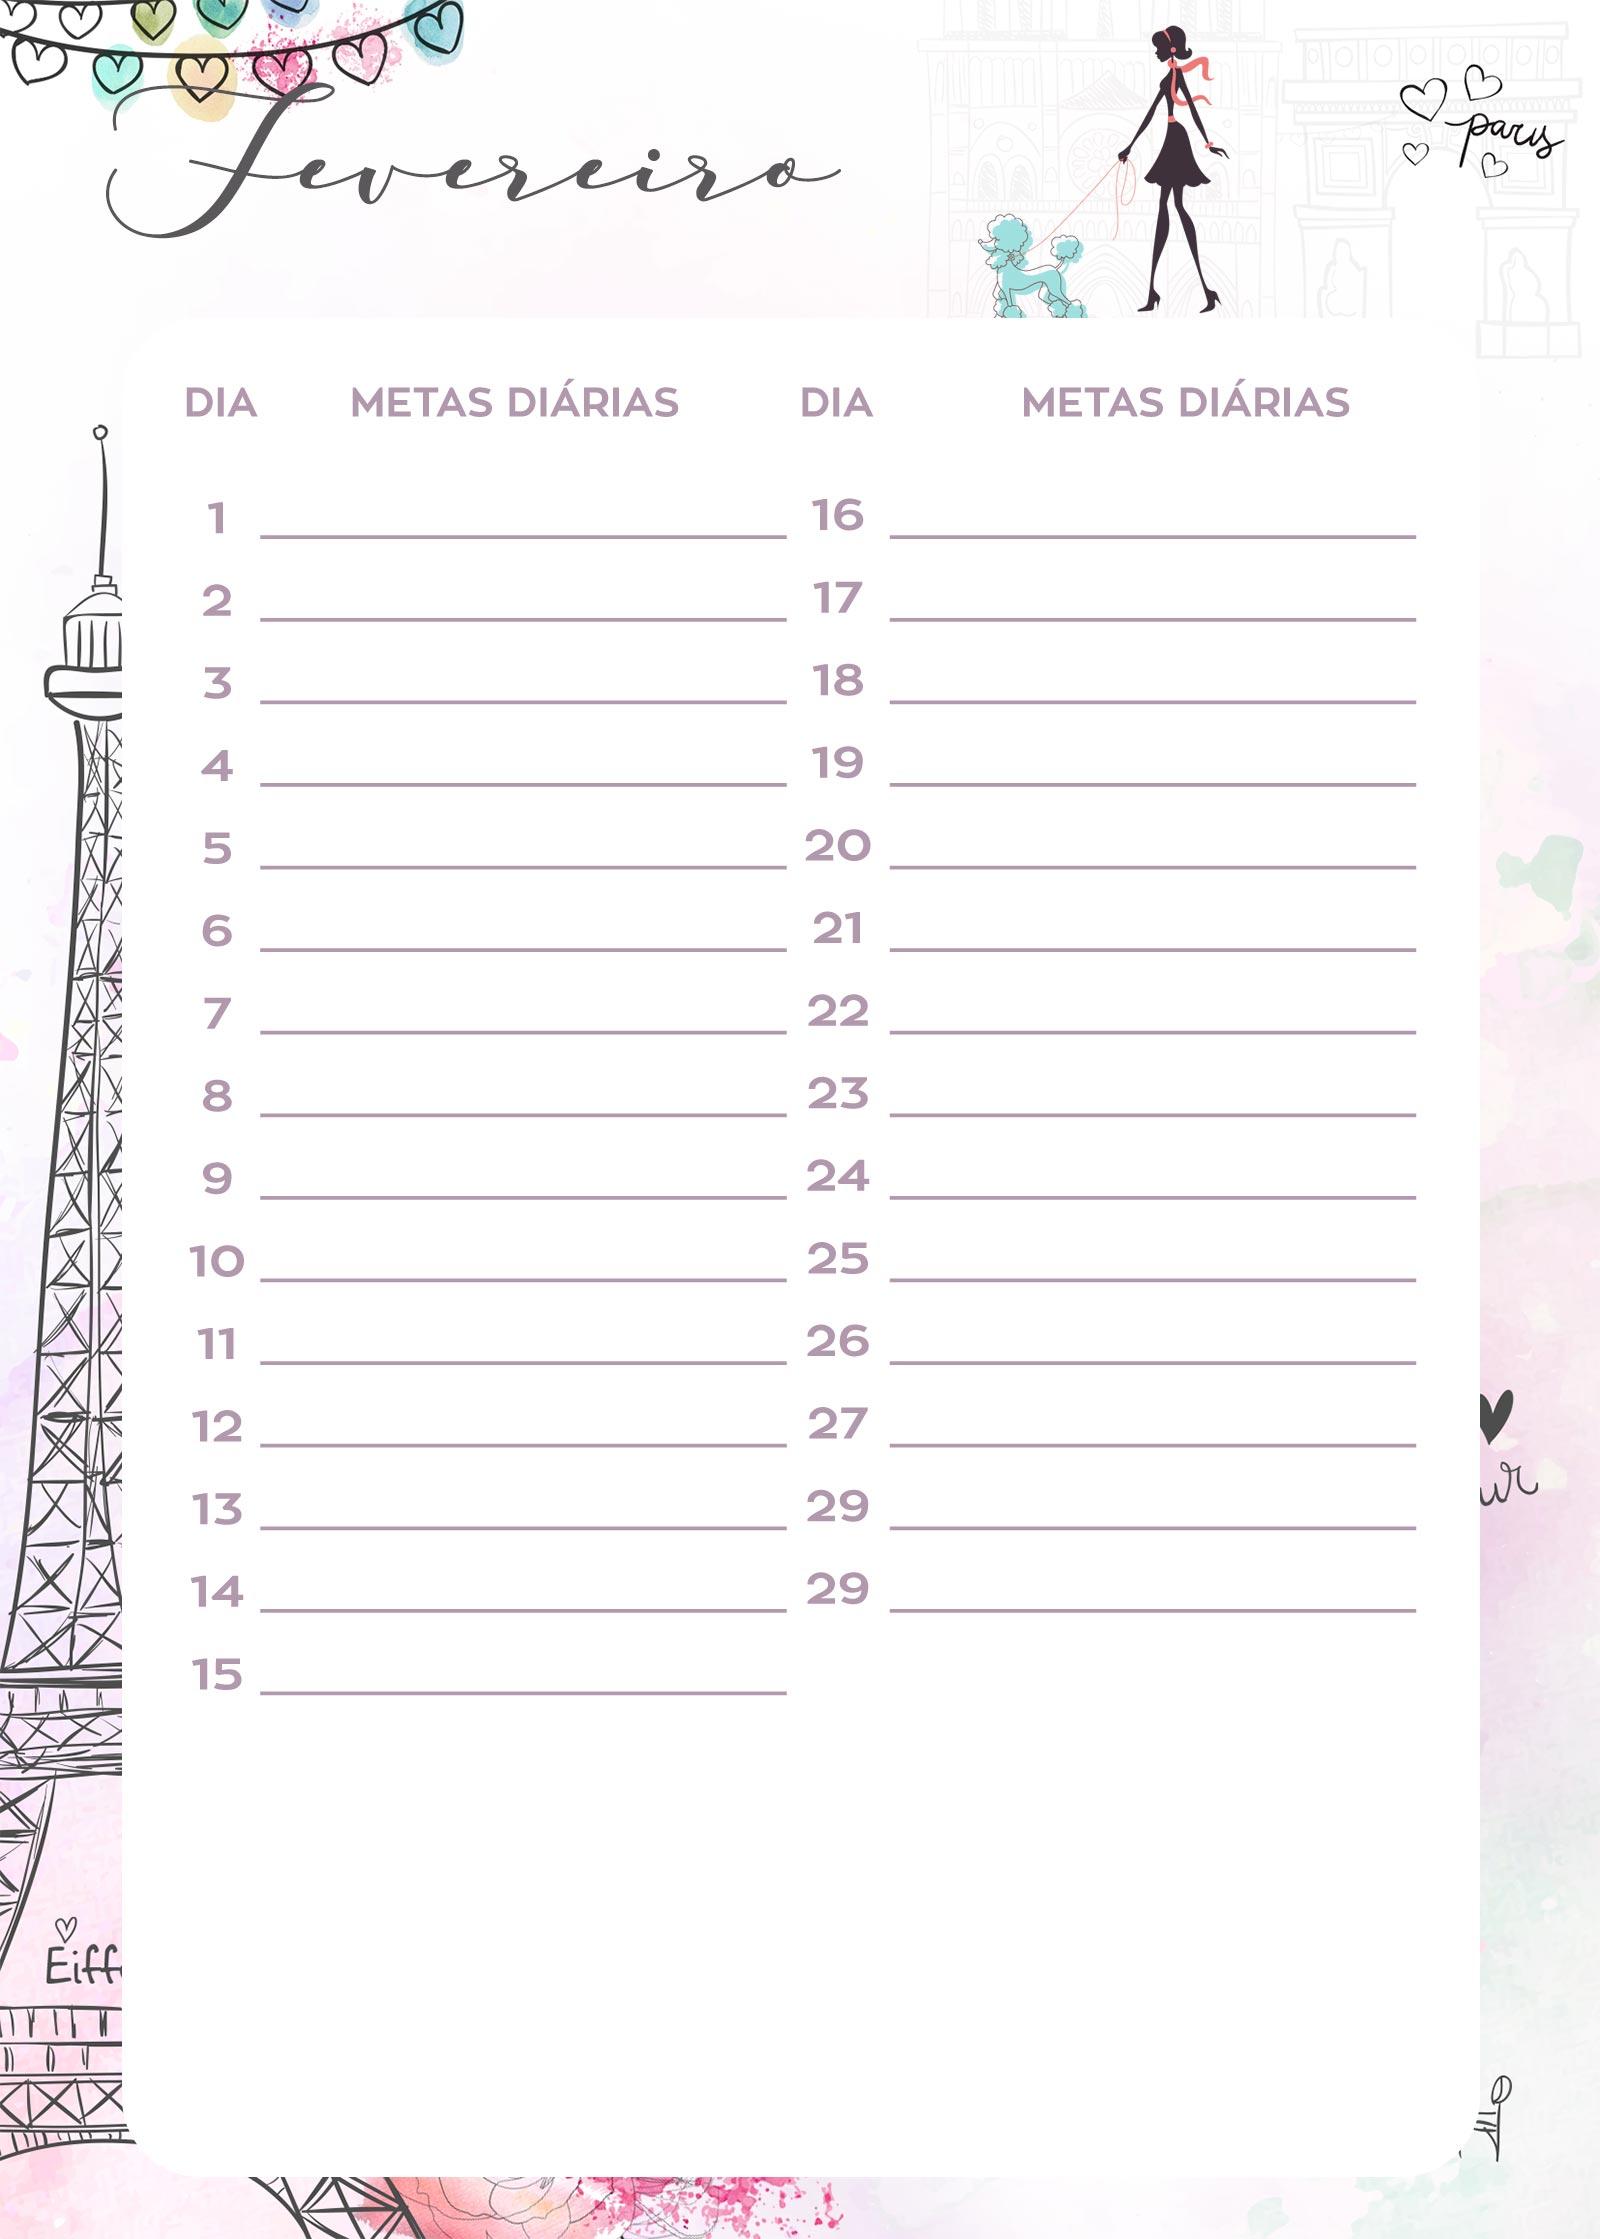 Planner Paris metas diarias fevereiro